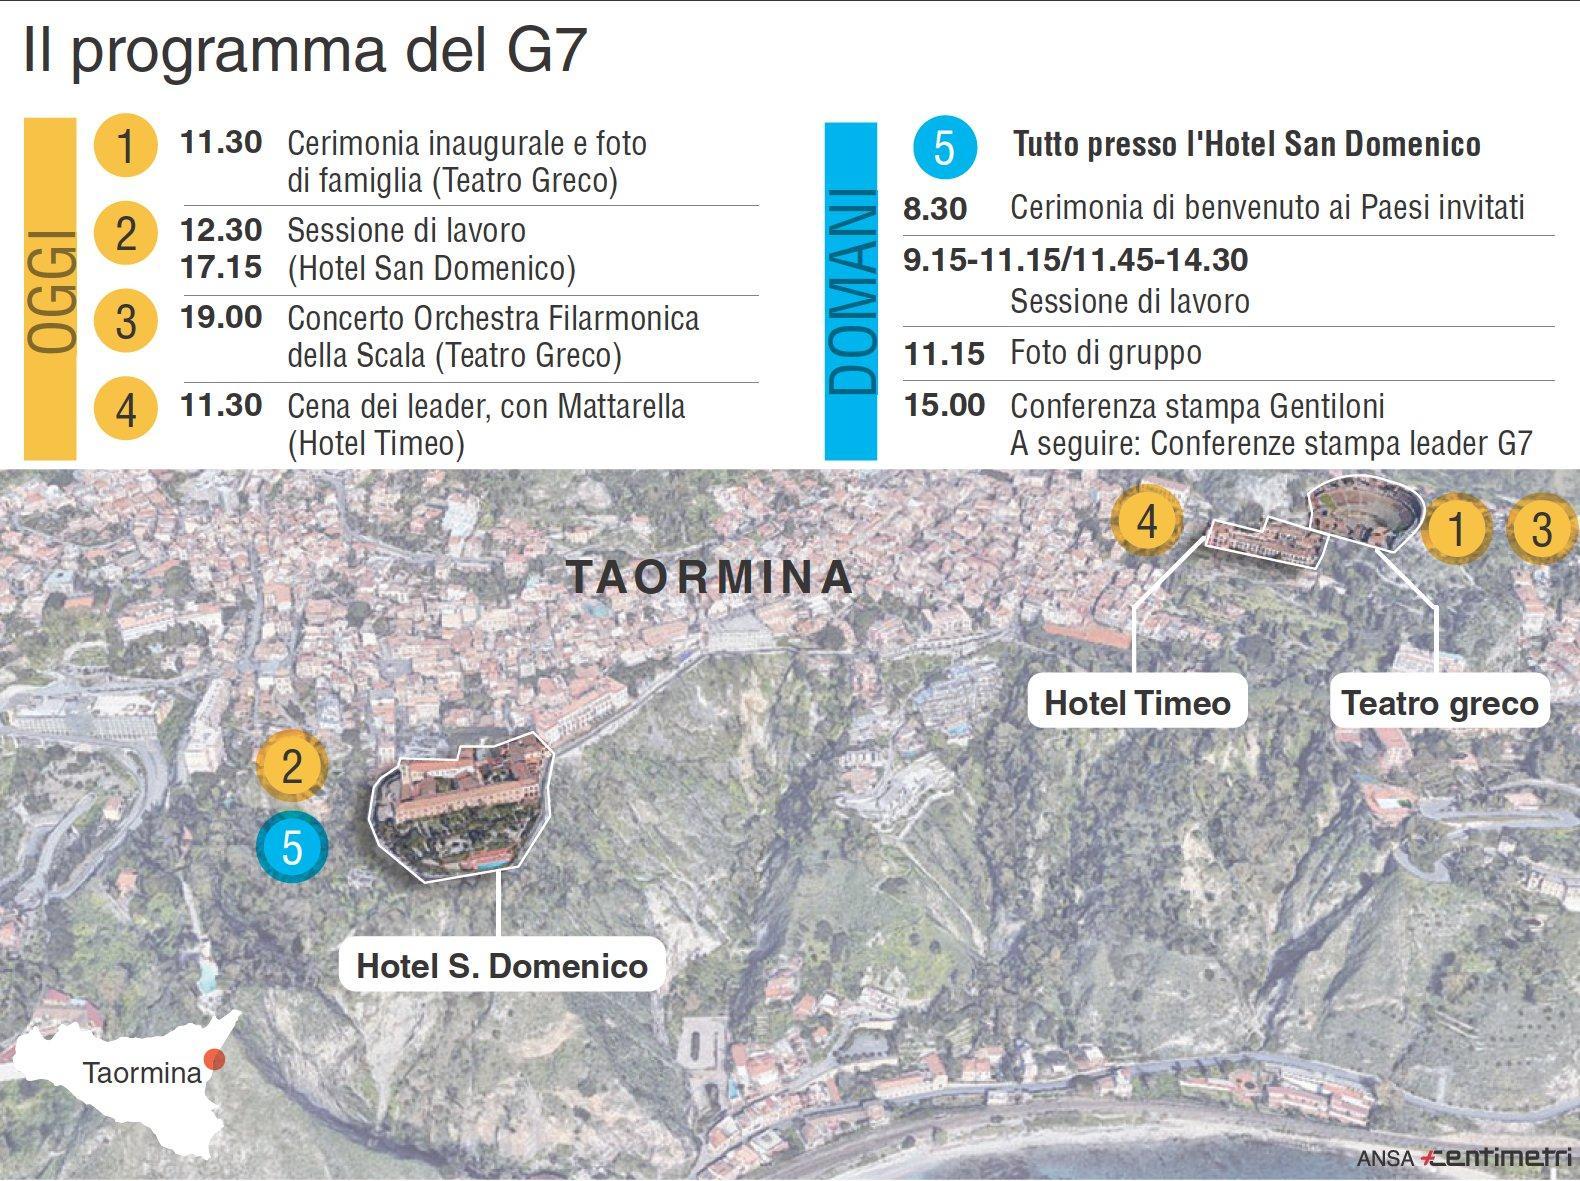 Il programma del G7 a Taormina